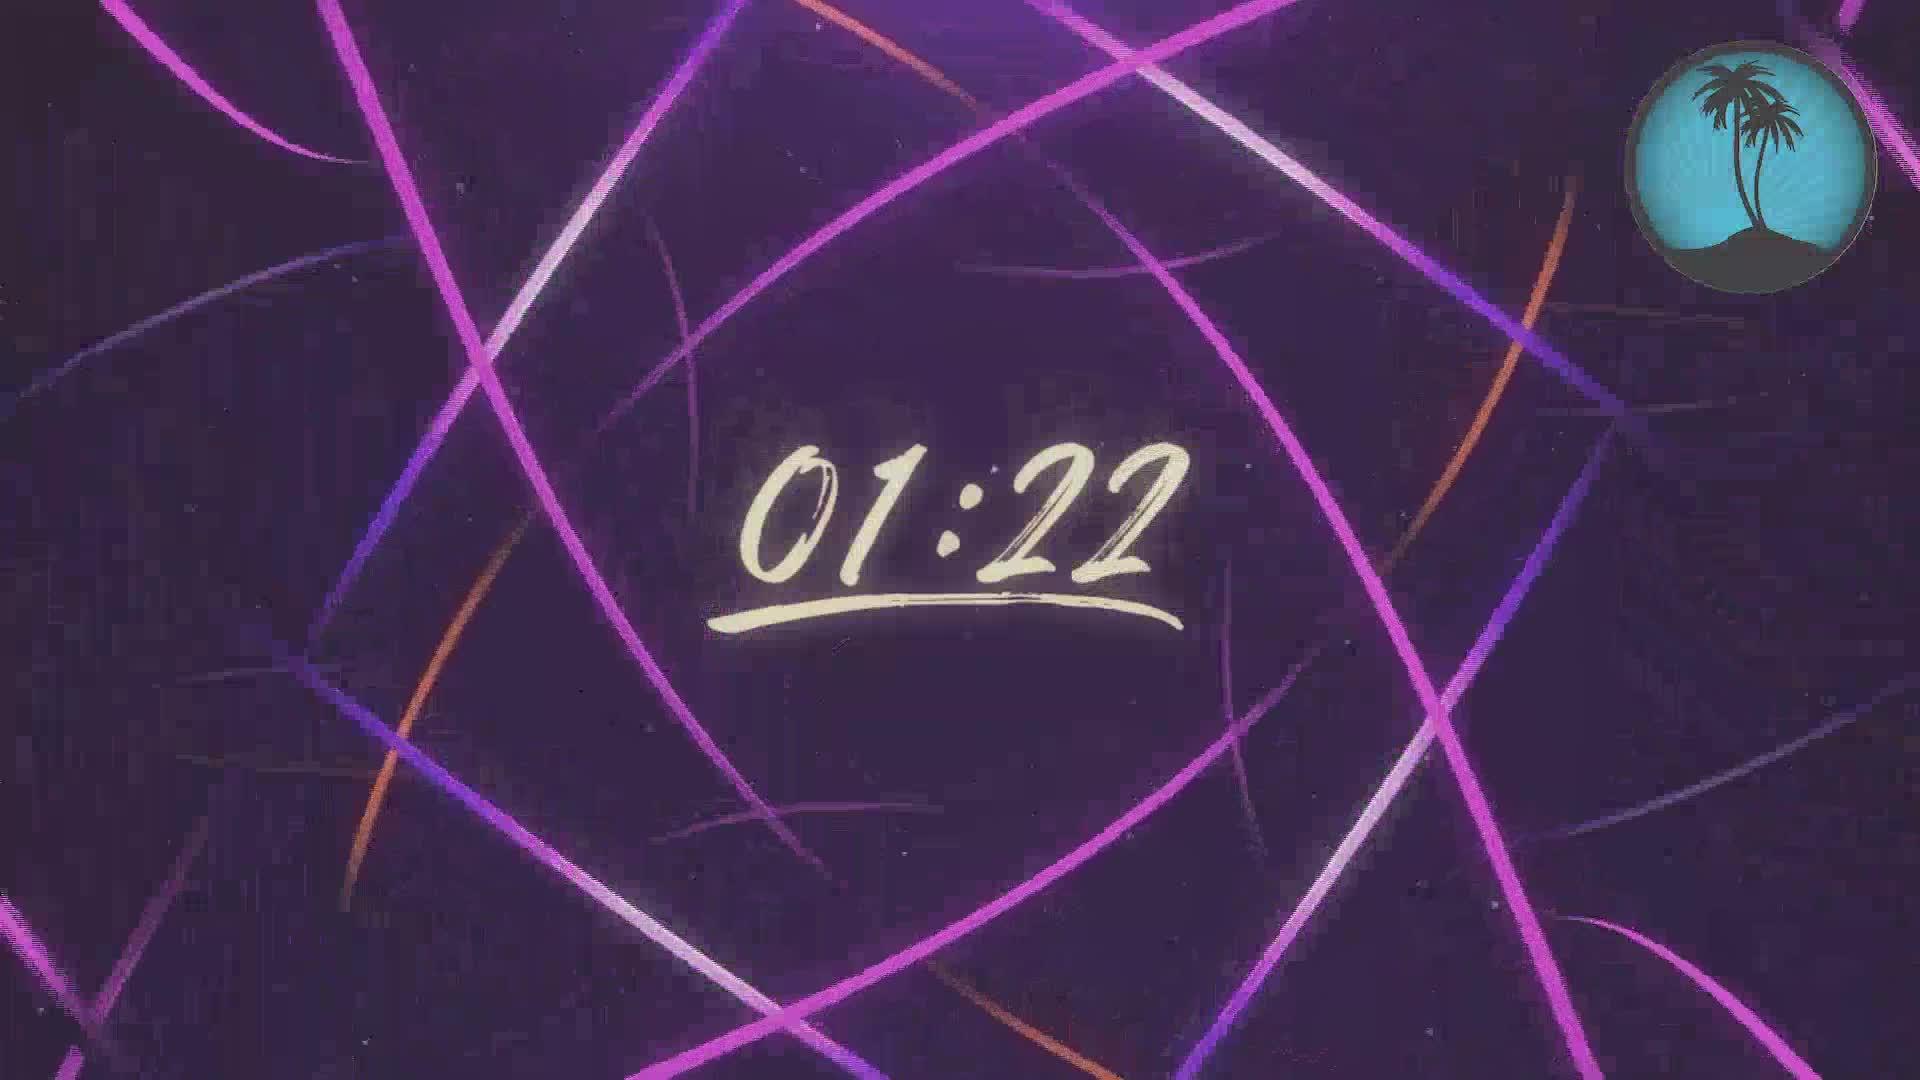 live-recording 4/18/2021 8:40:02 AM